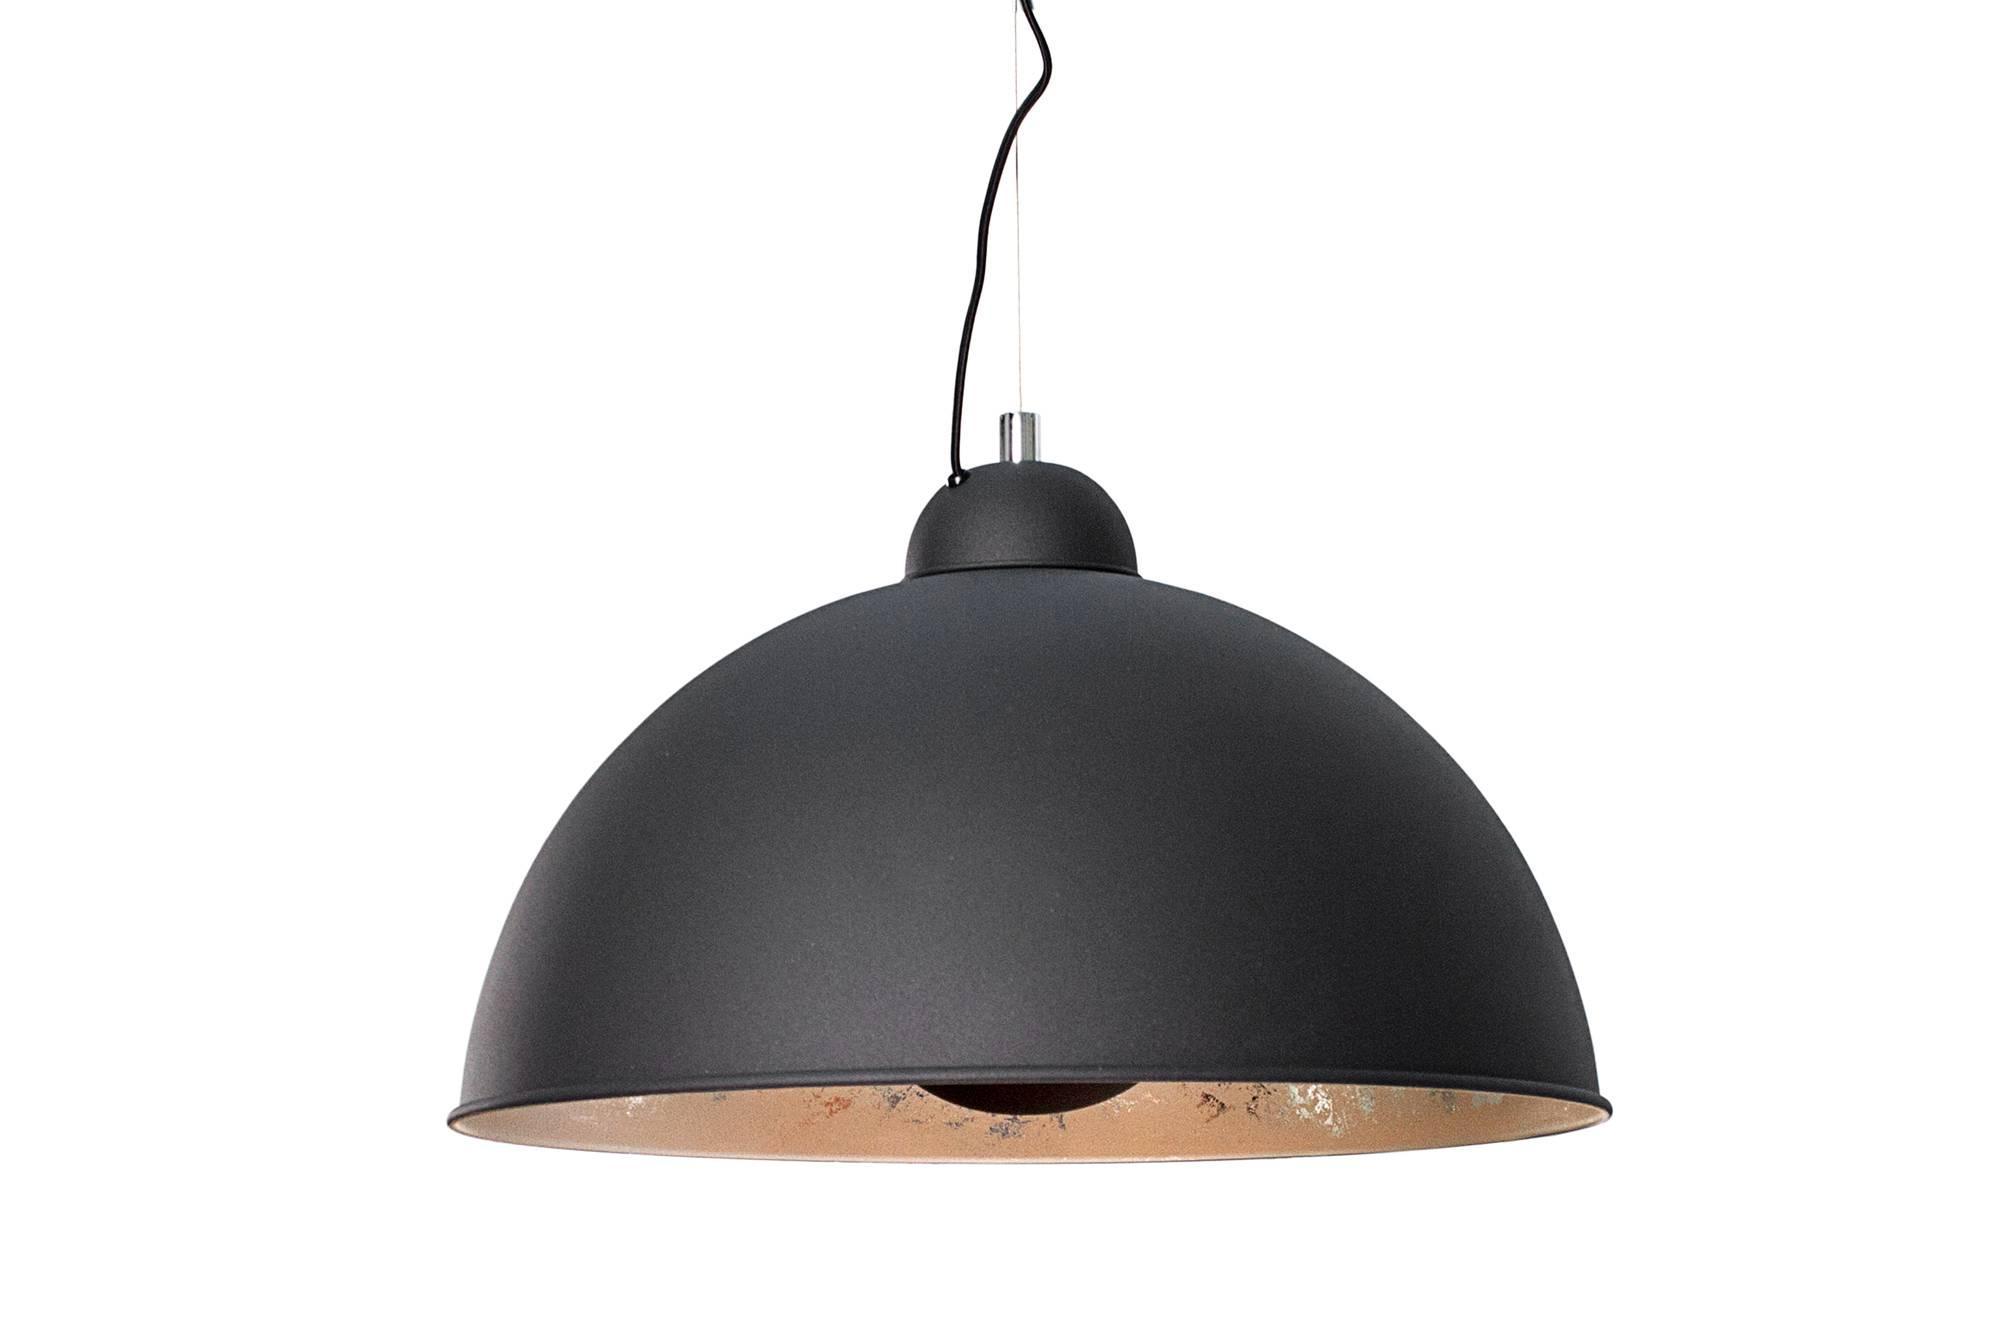 Lampa Atelier čierno-strieborná